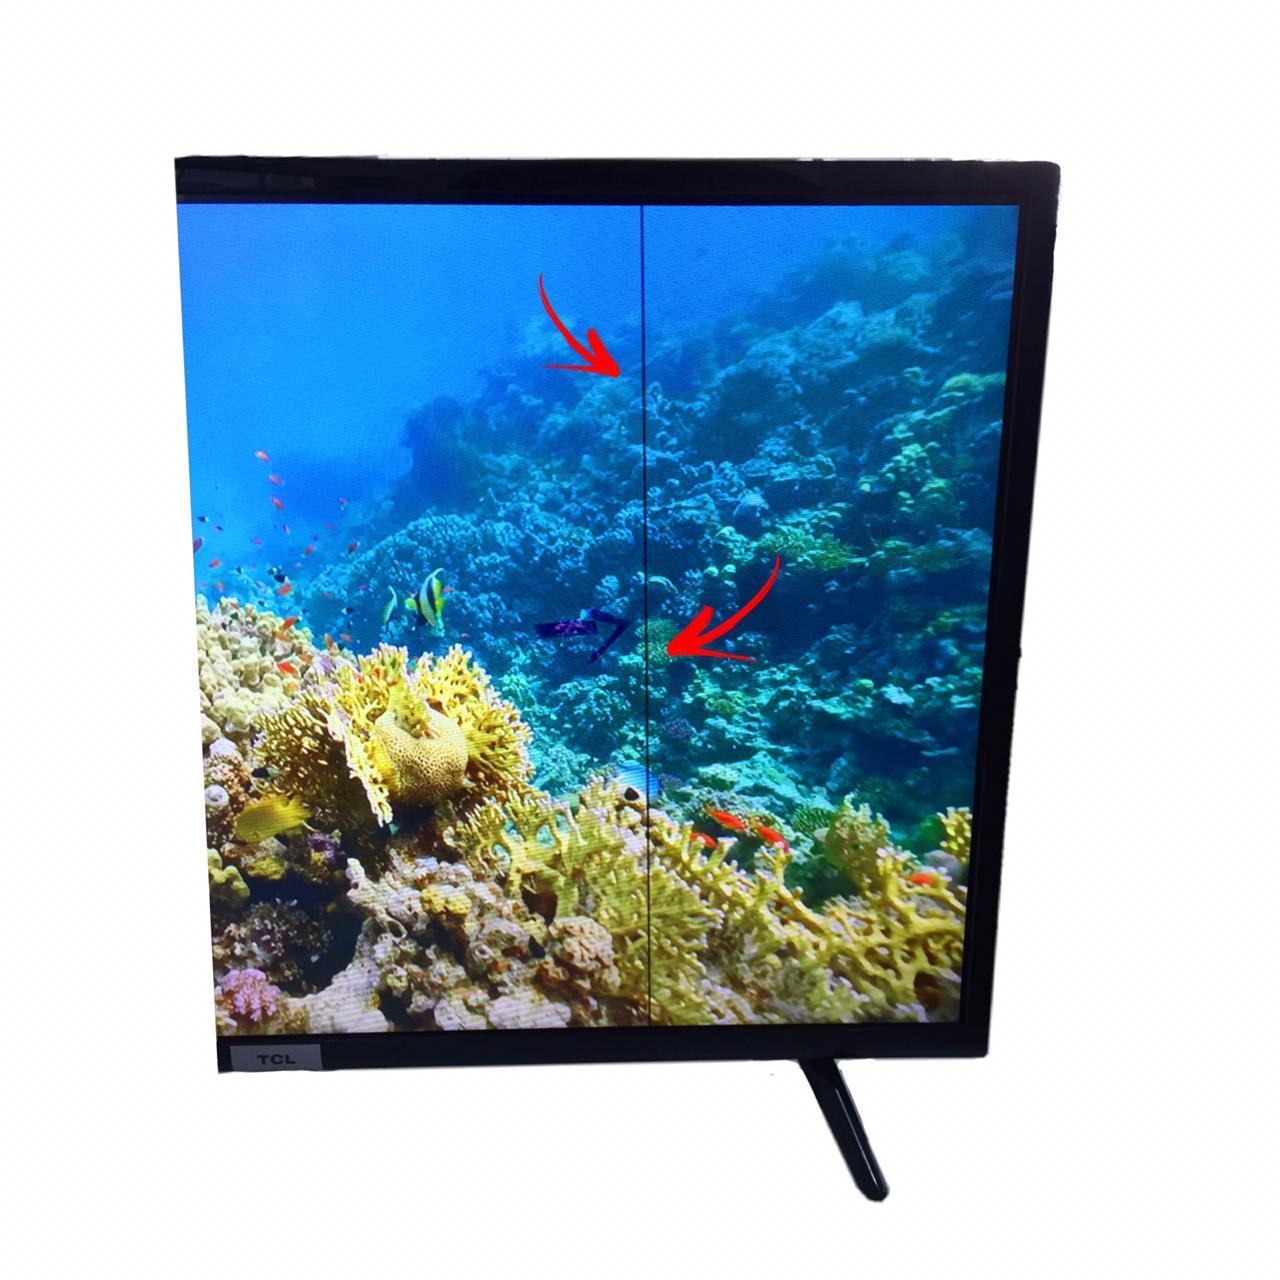 "Smart TV LED 32"" SEMP TCL 32S6500 Android Wi-Fi - HDR Inteligência Artificial 2 HDMI USB (possui linha de led na vertical)"